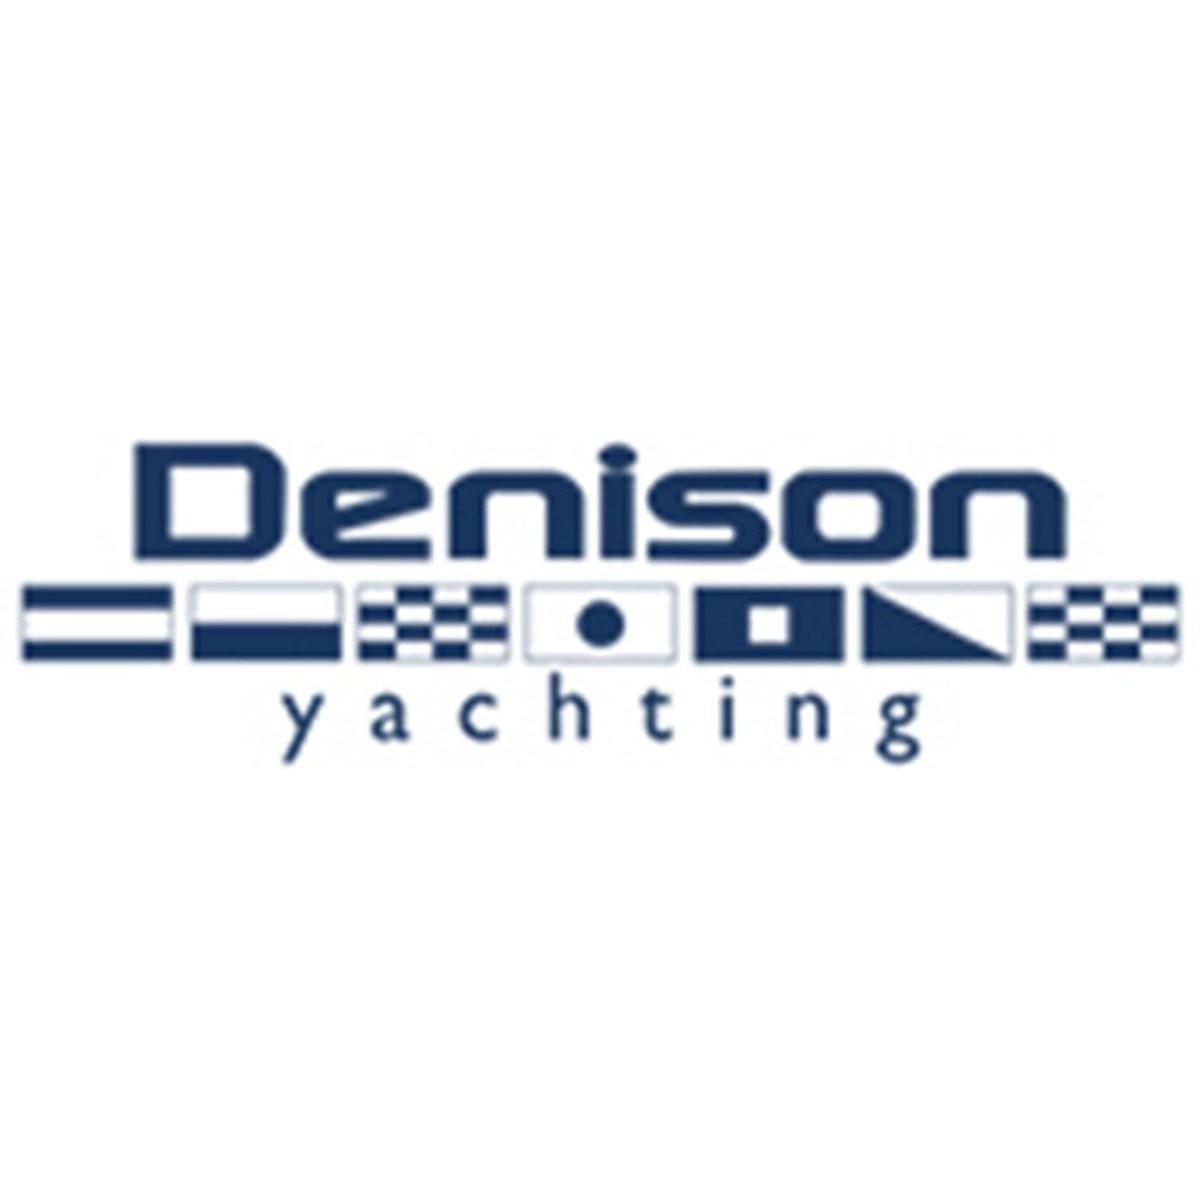 Denison Large_1155